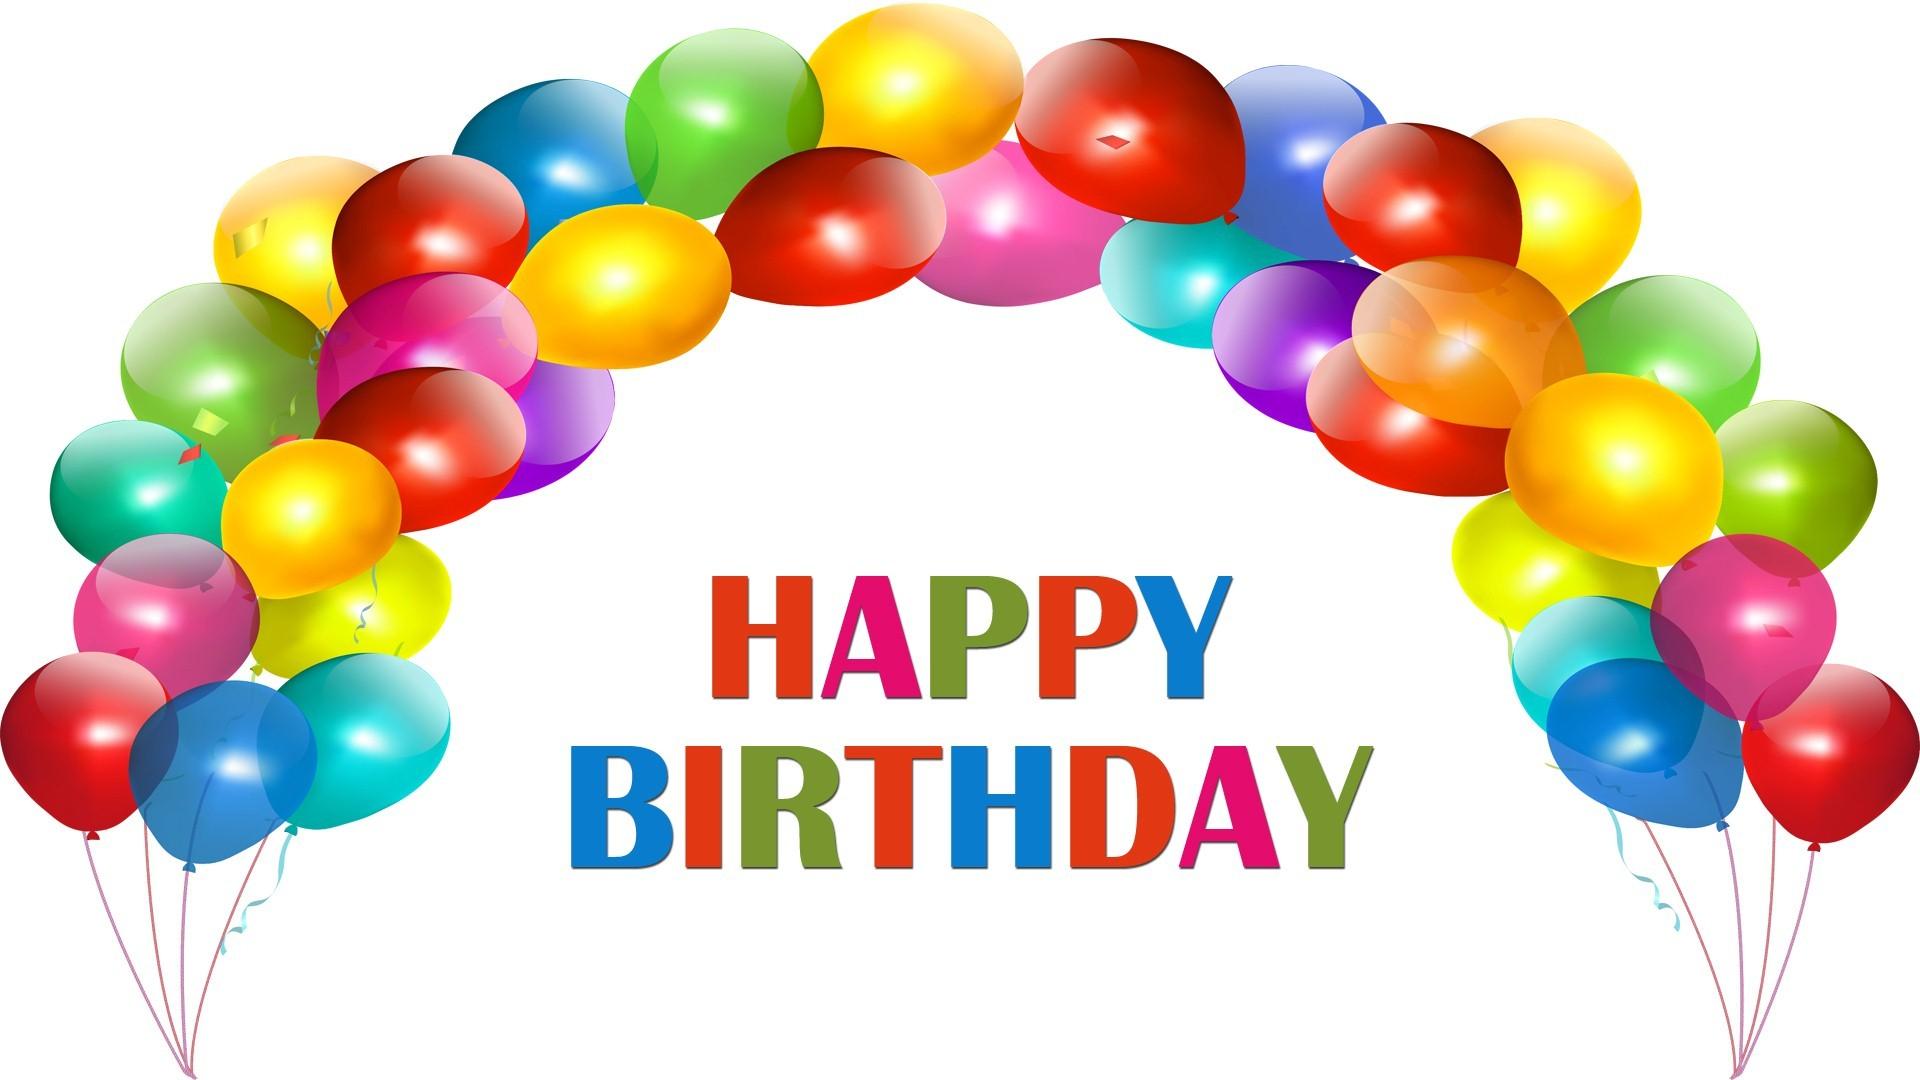 Happy birthday wallpaper 64 images - Happy birthday balloon images hd ...